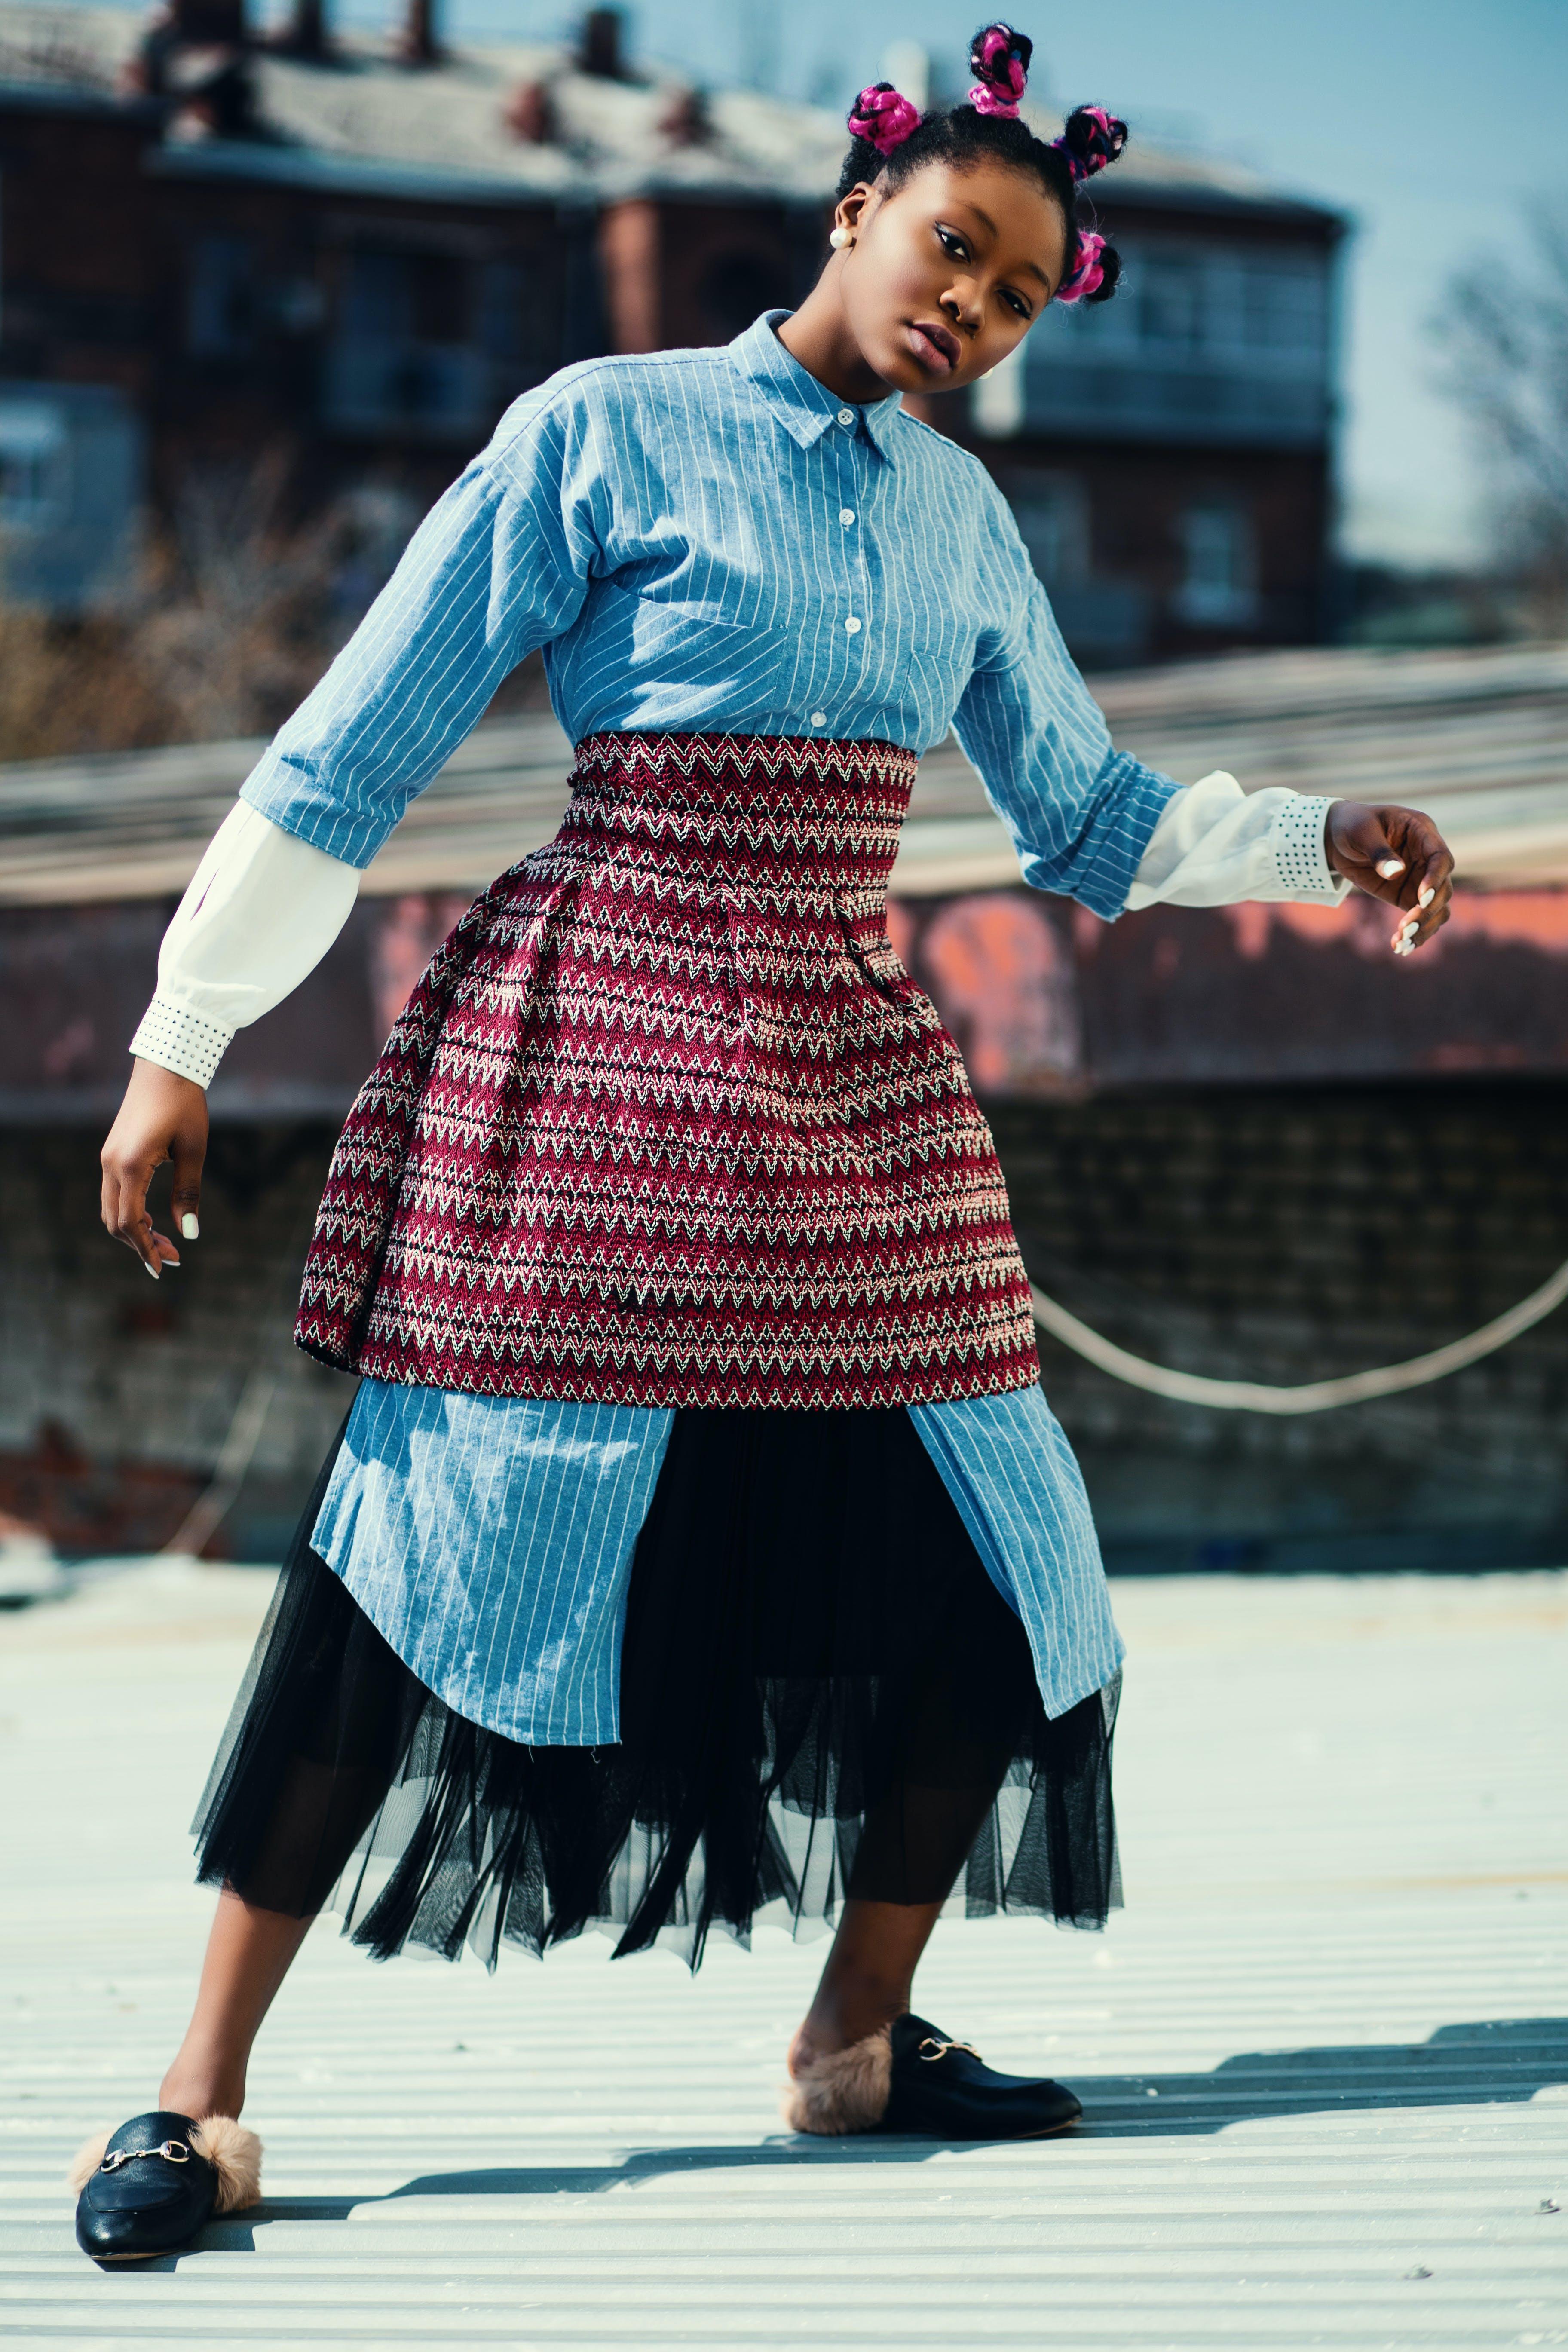 Kostenloses Stock Foto zu afroamerikaner-frau, dach, dame, damenmode